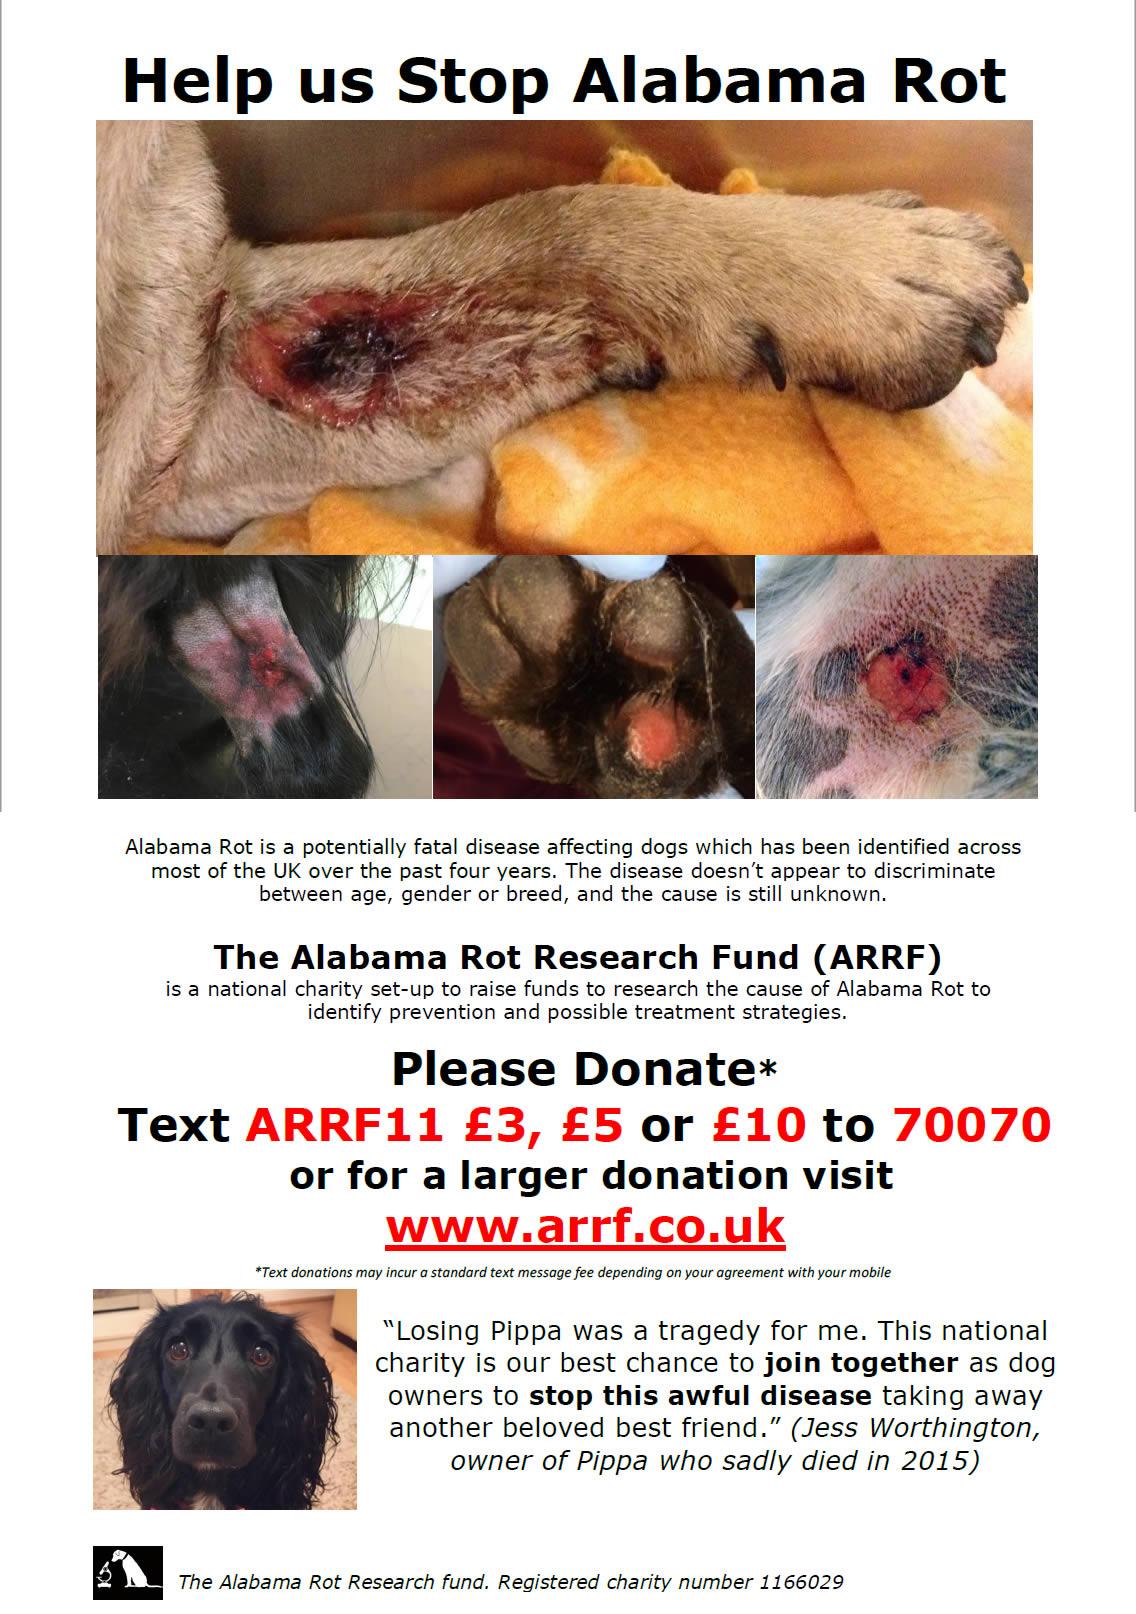 Help us stop Alabama Rot